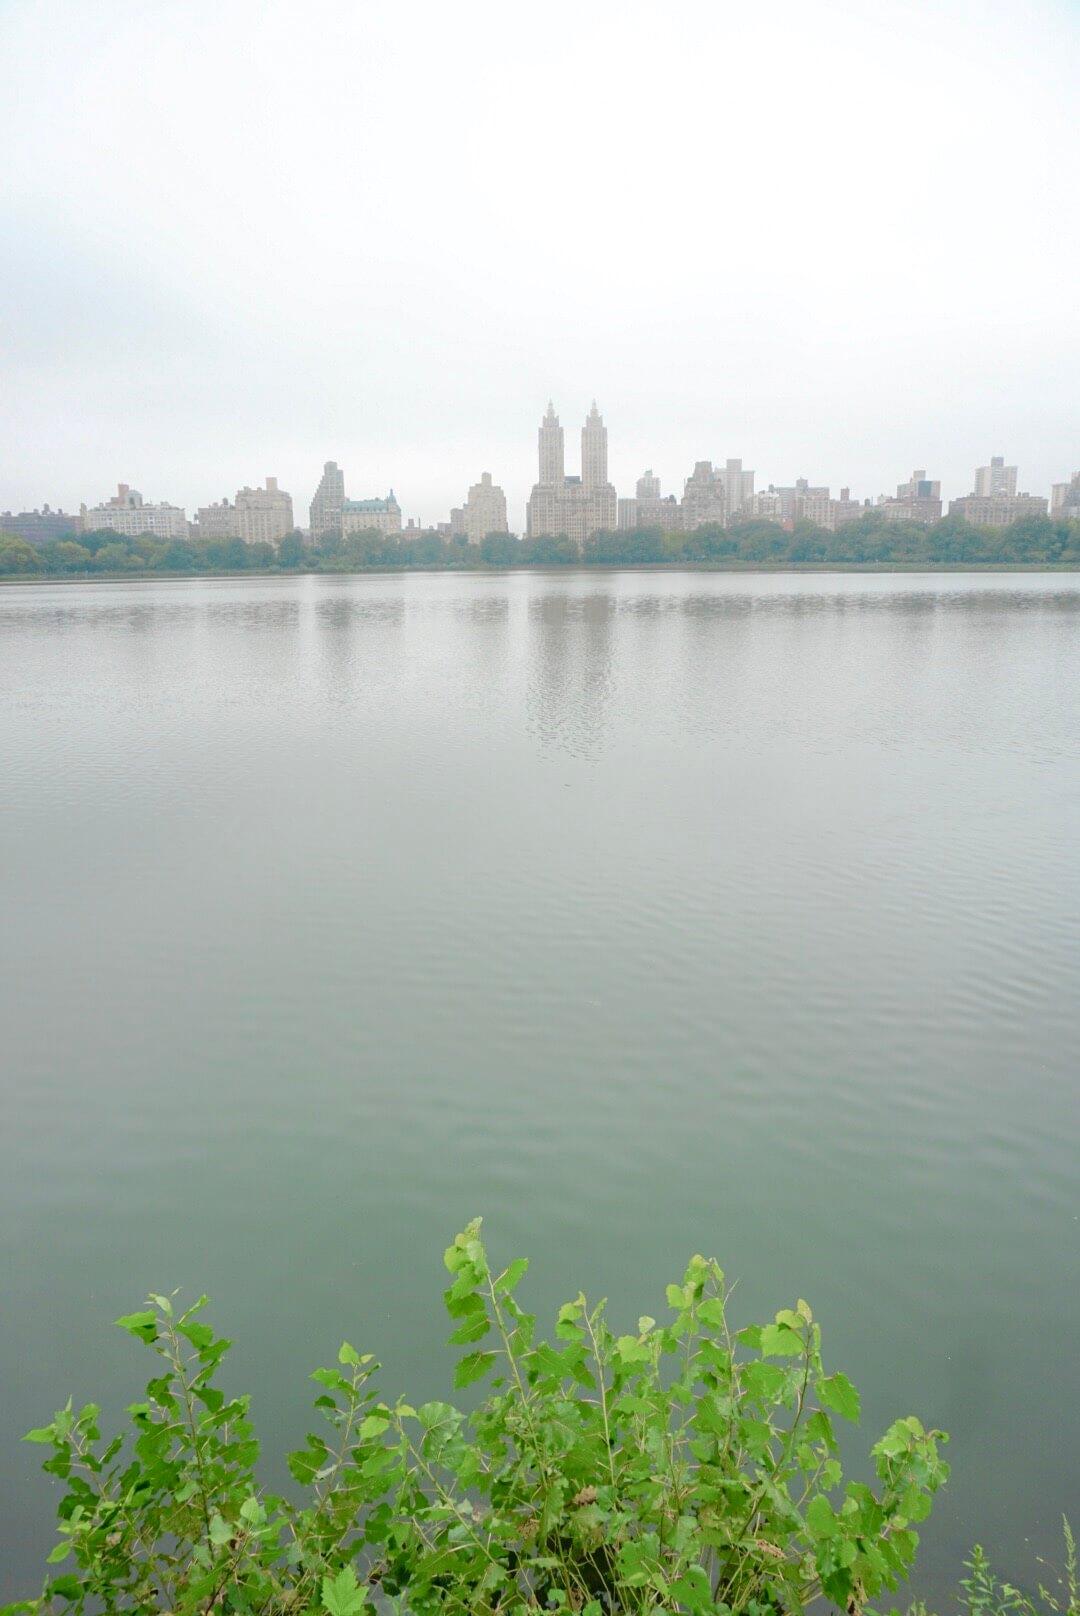 réserve eau lac jacuy kennedy new york